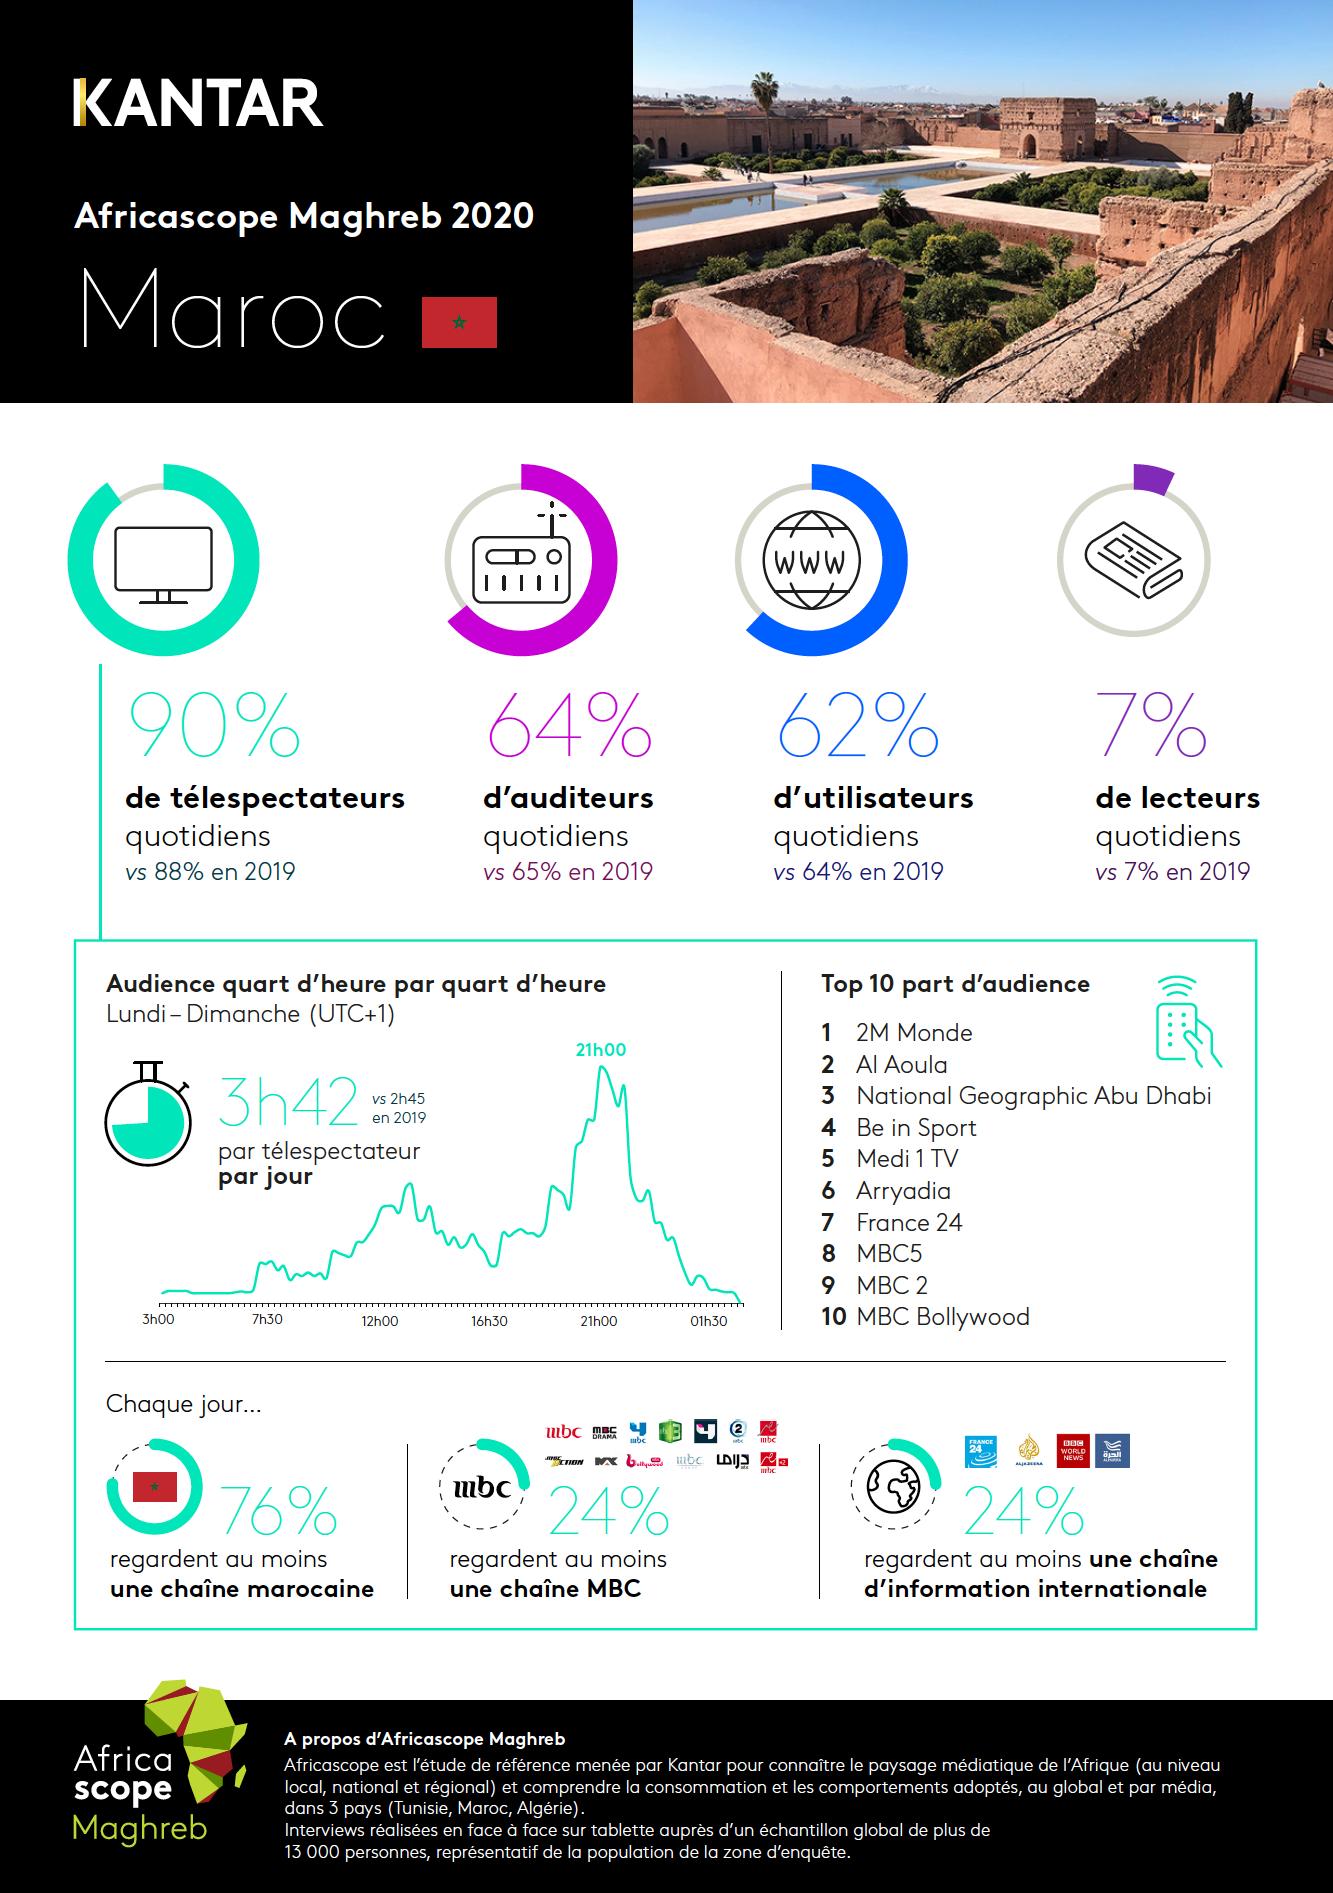 Kantar publie les résultats Africascope Maghreb 2020